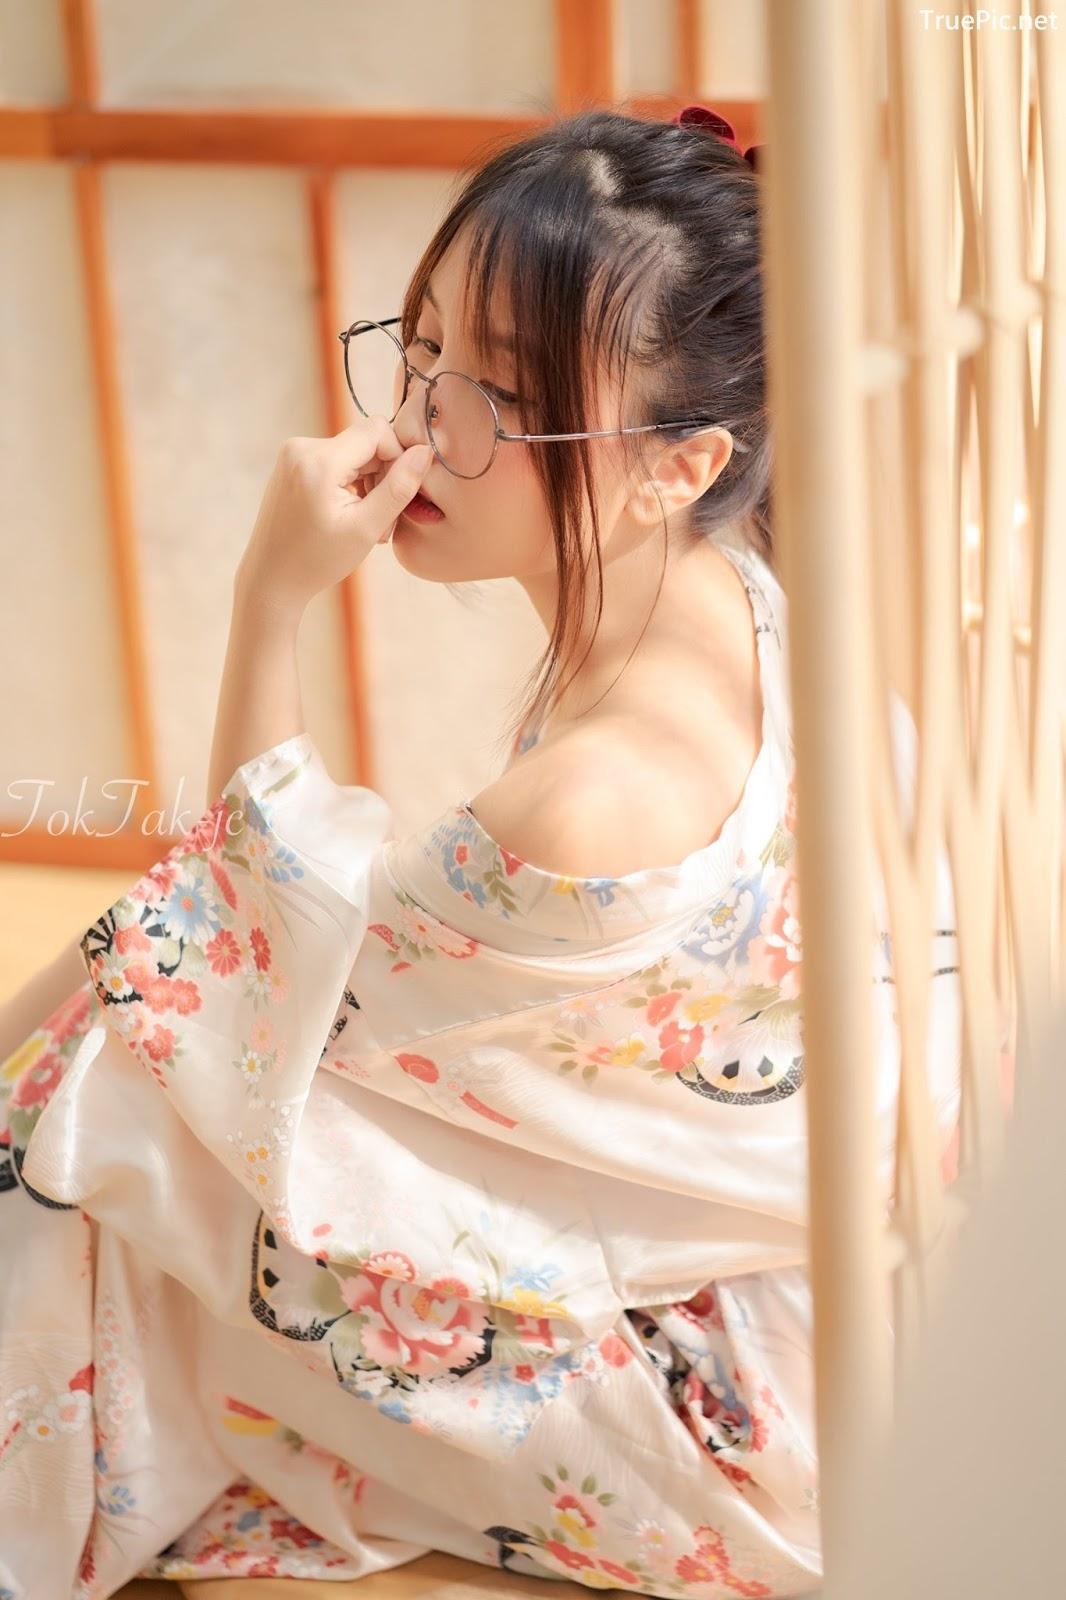 Image Thailand Model - Phunnita Intarapimai - Sexy Kendo Girl - TruePic.net - Picture-5